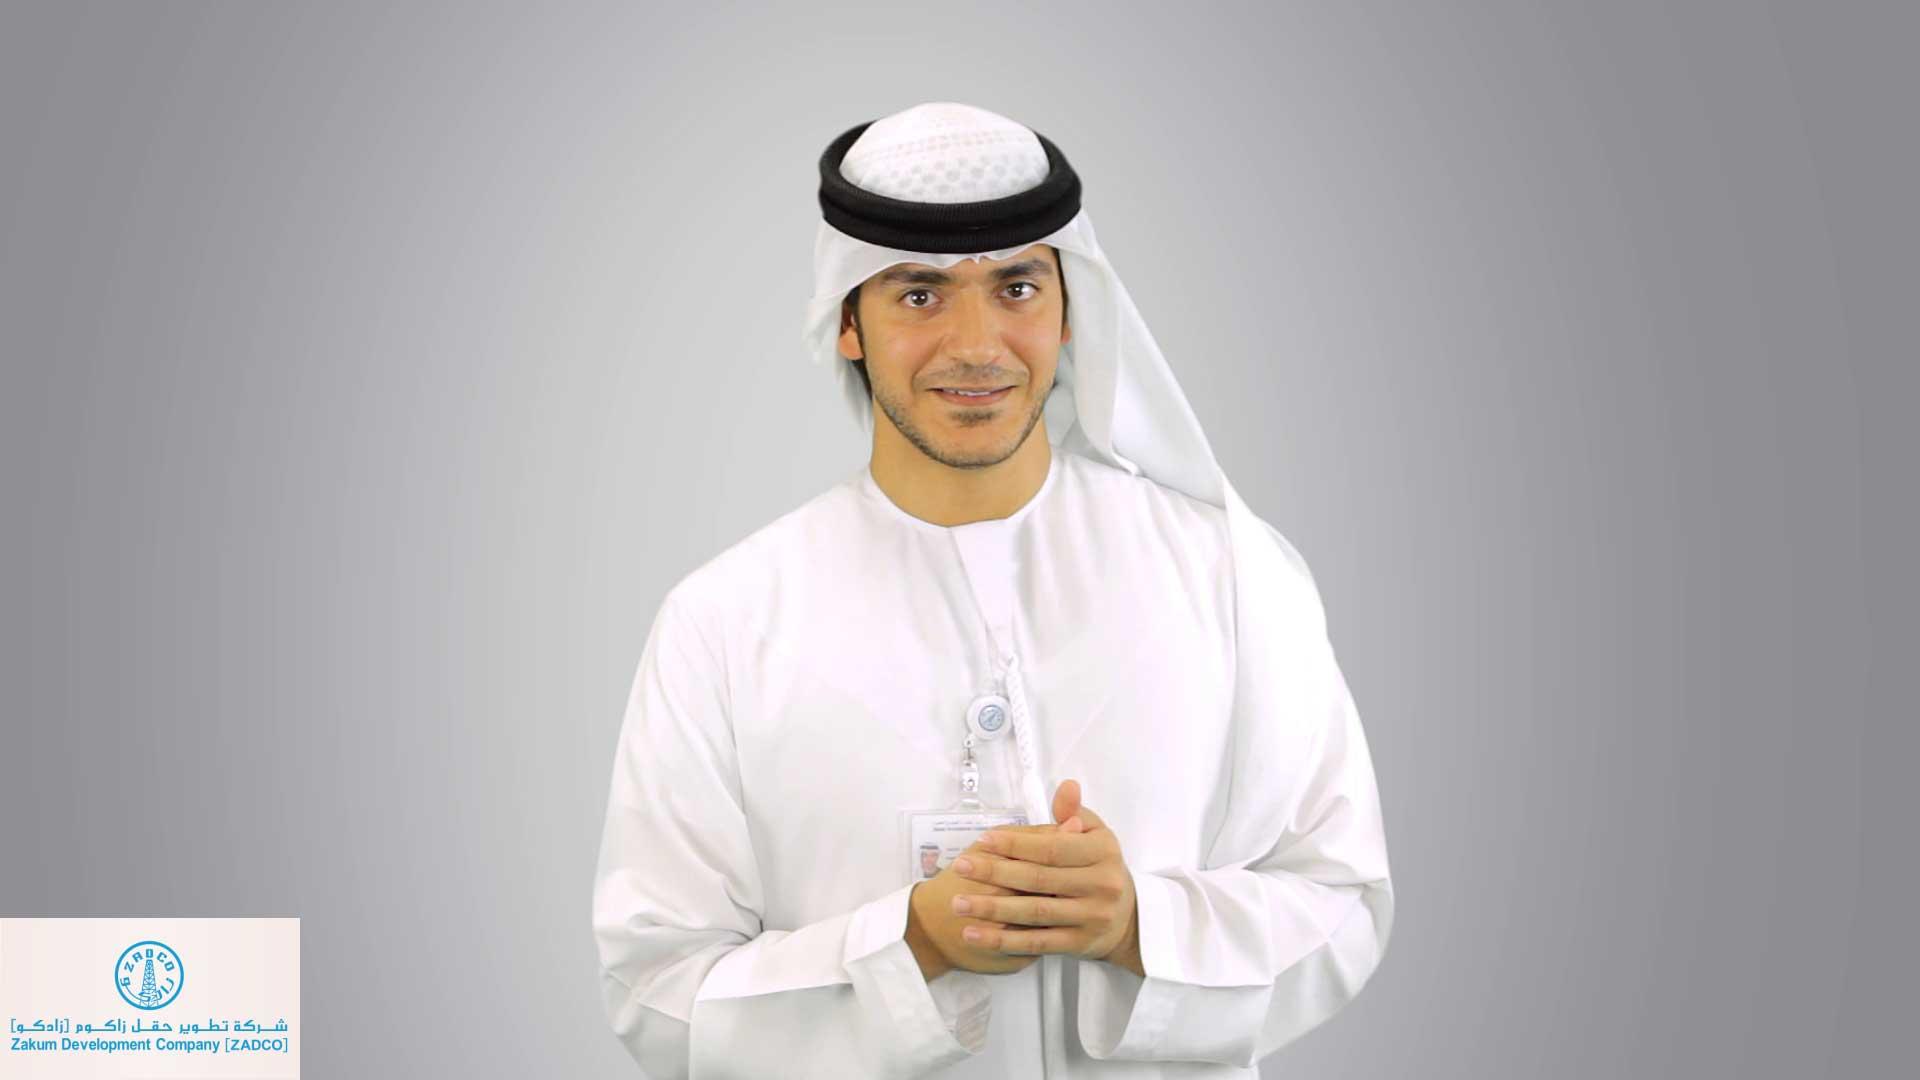 HR Internal Communication Video for ADNOC Abu Dhabi National Oil Company